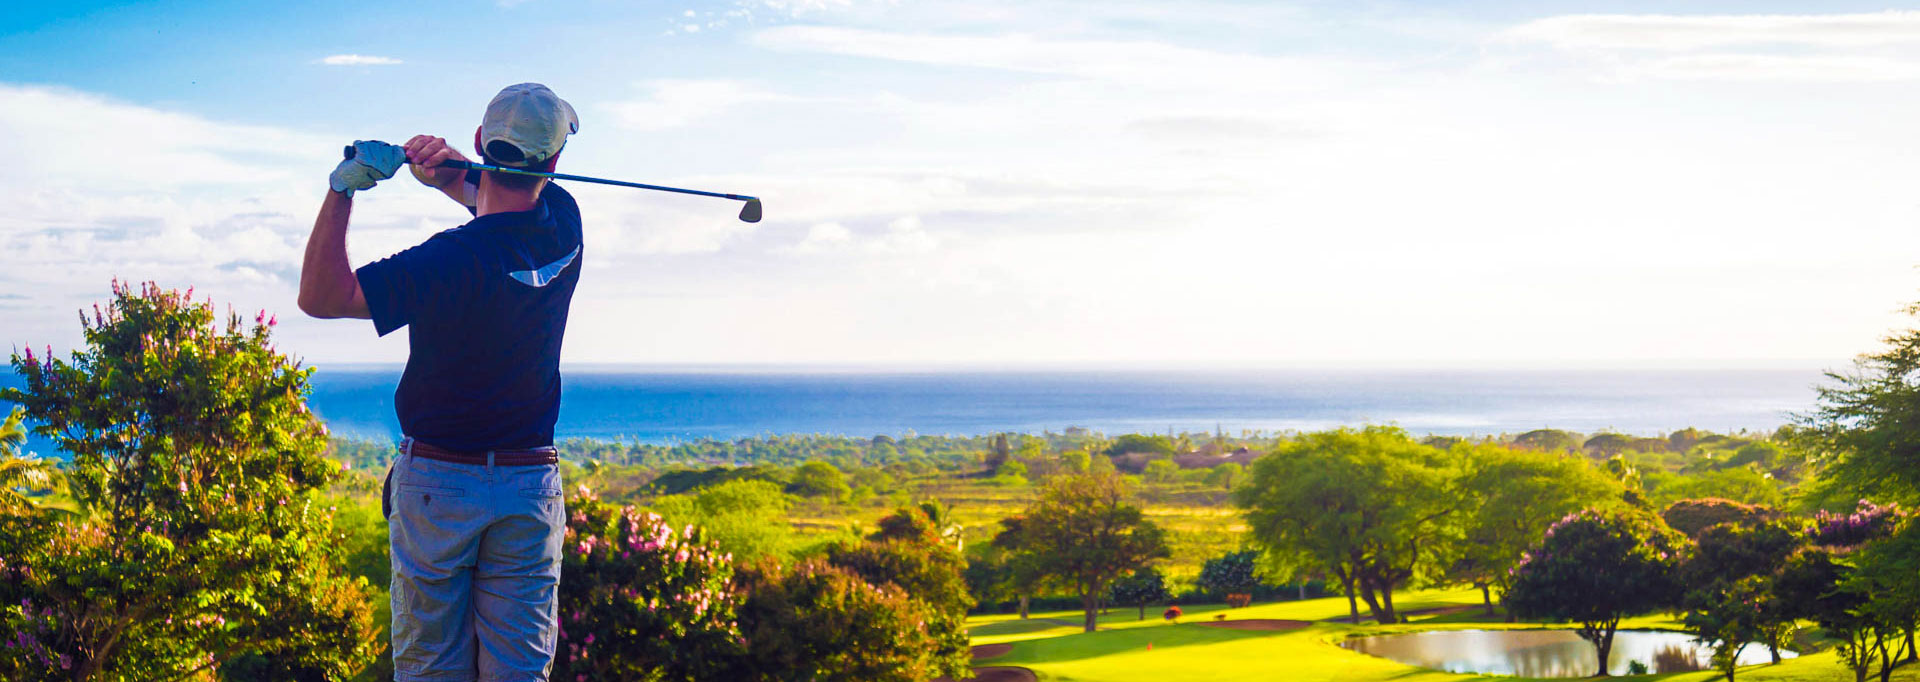 Golf at Round Hill